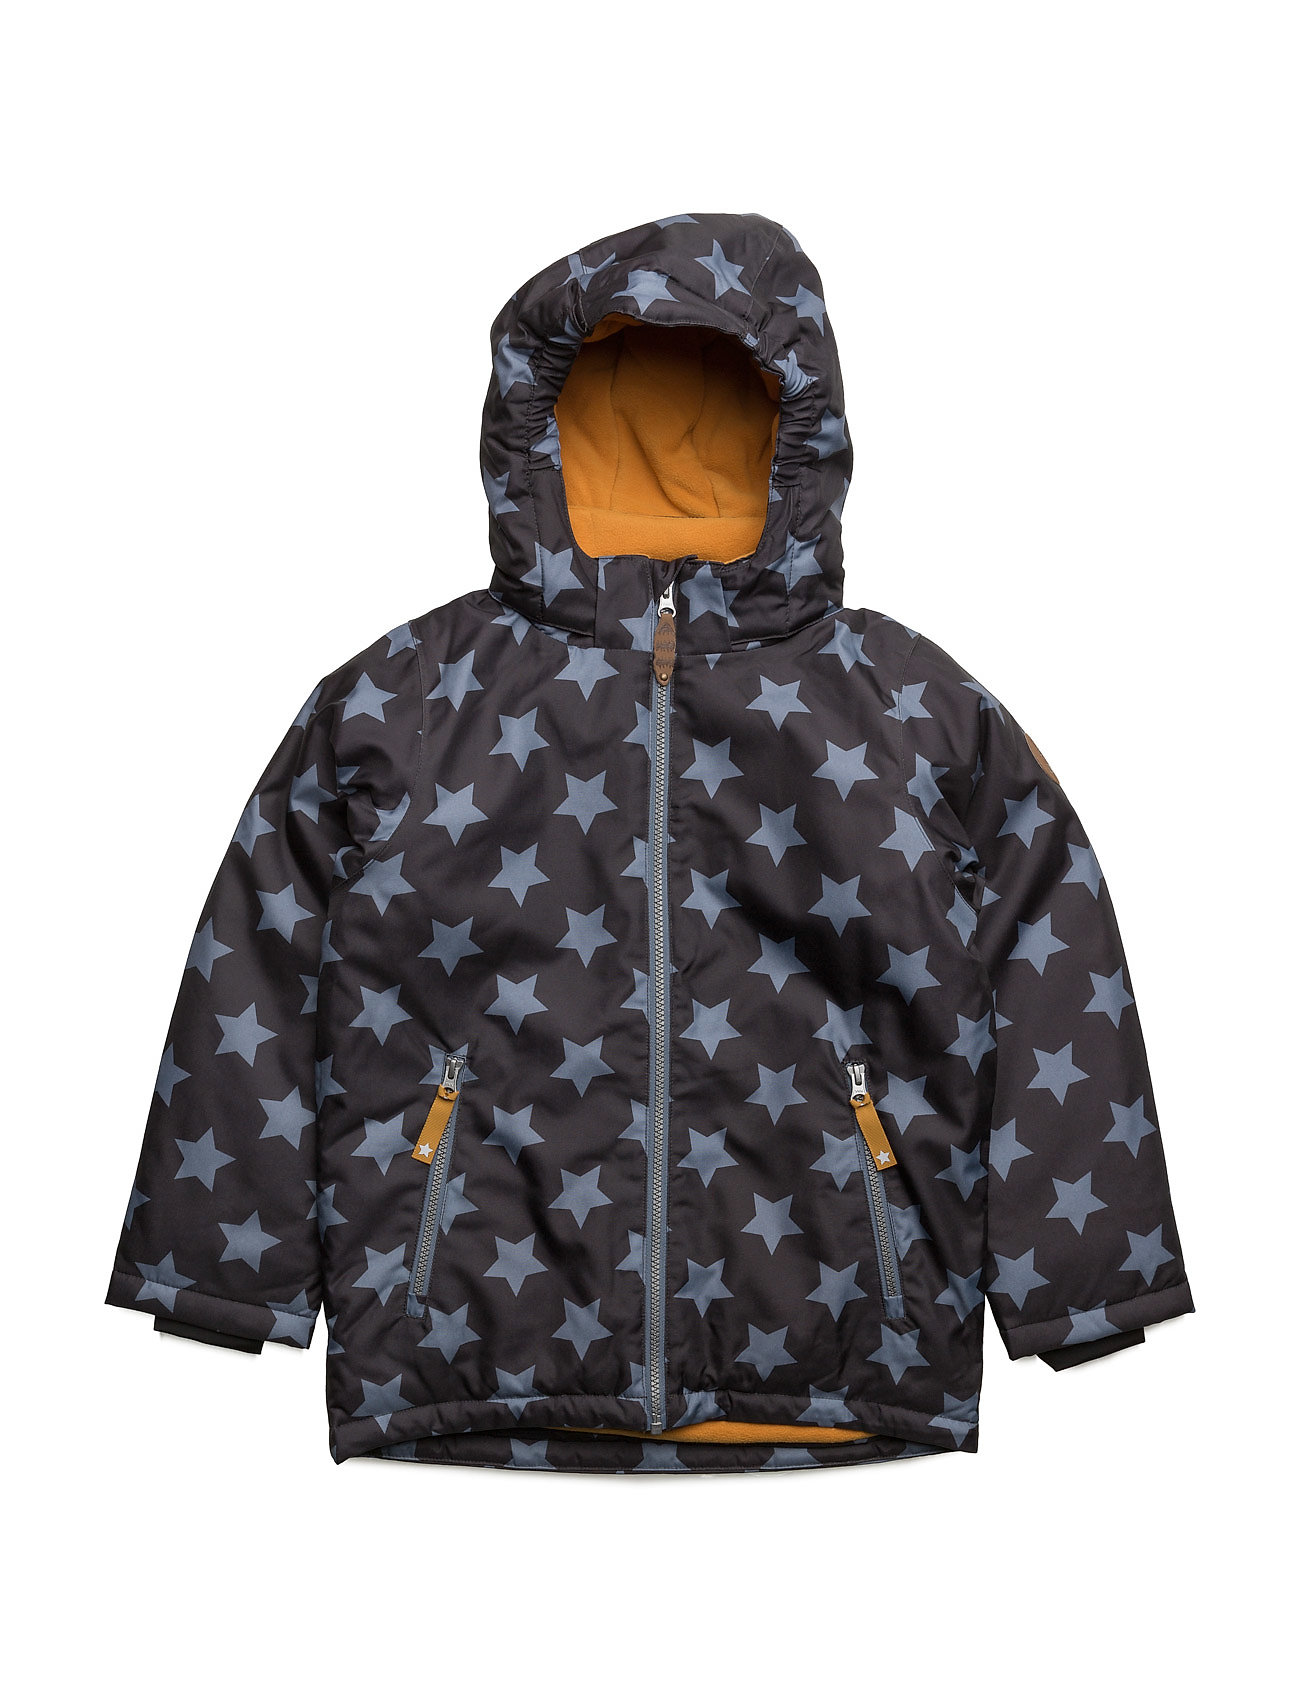 racoon outdoor – Alfred star jacket på boozt.com dk